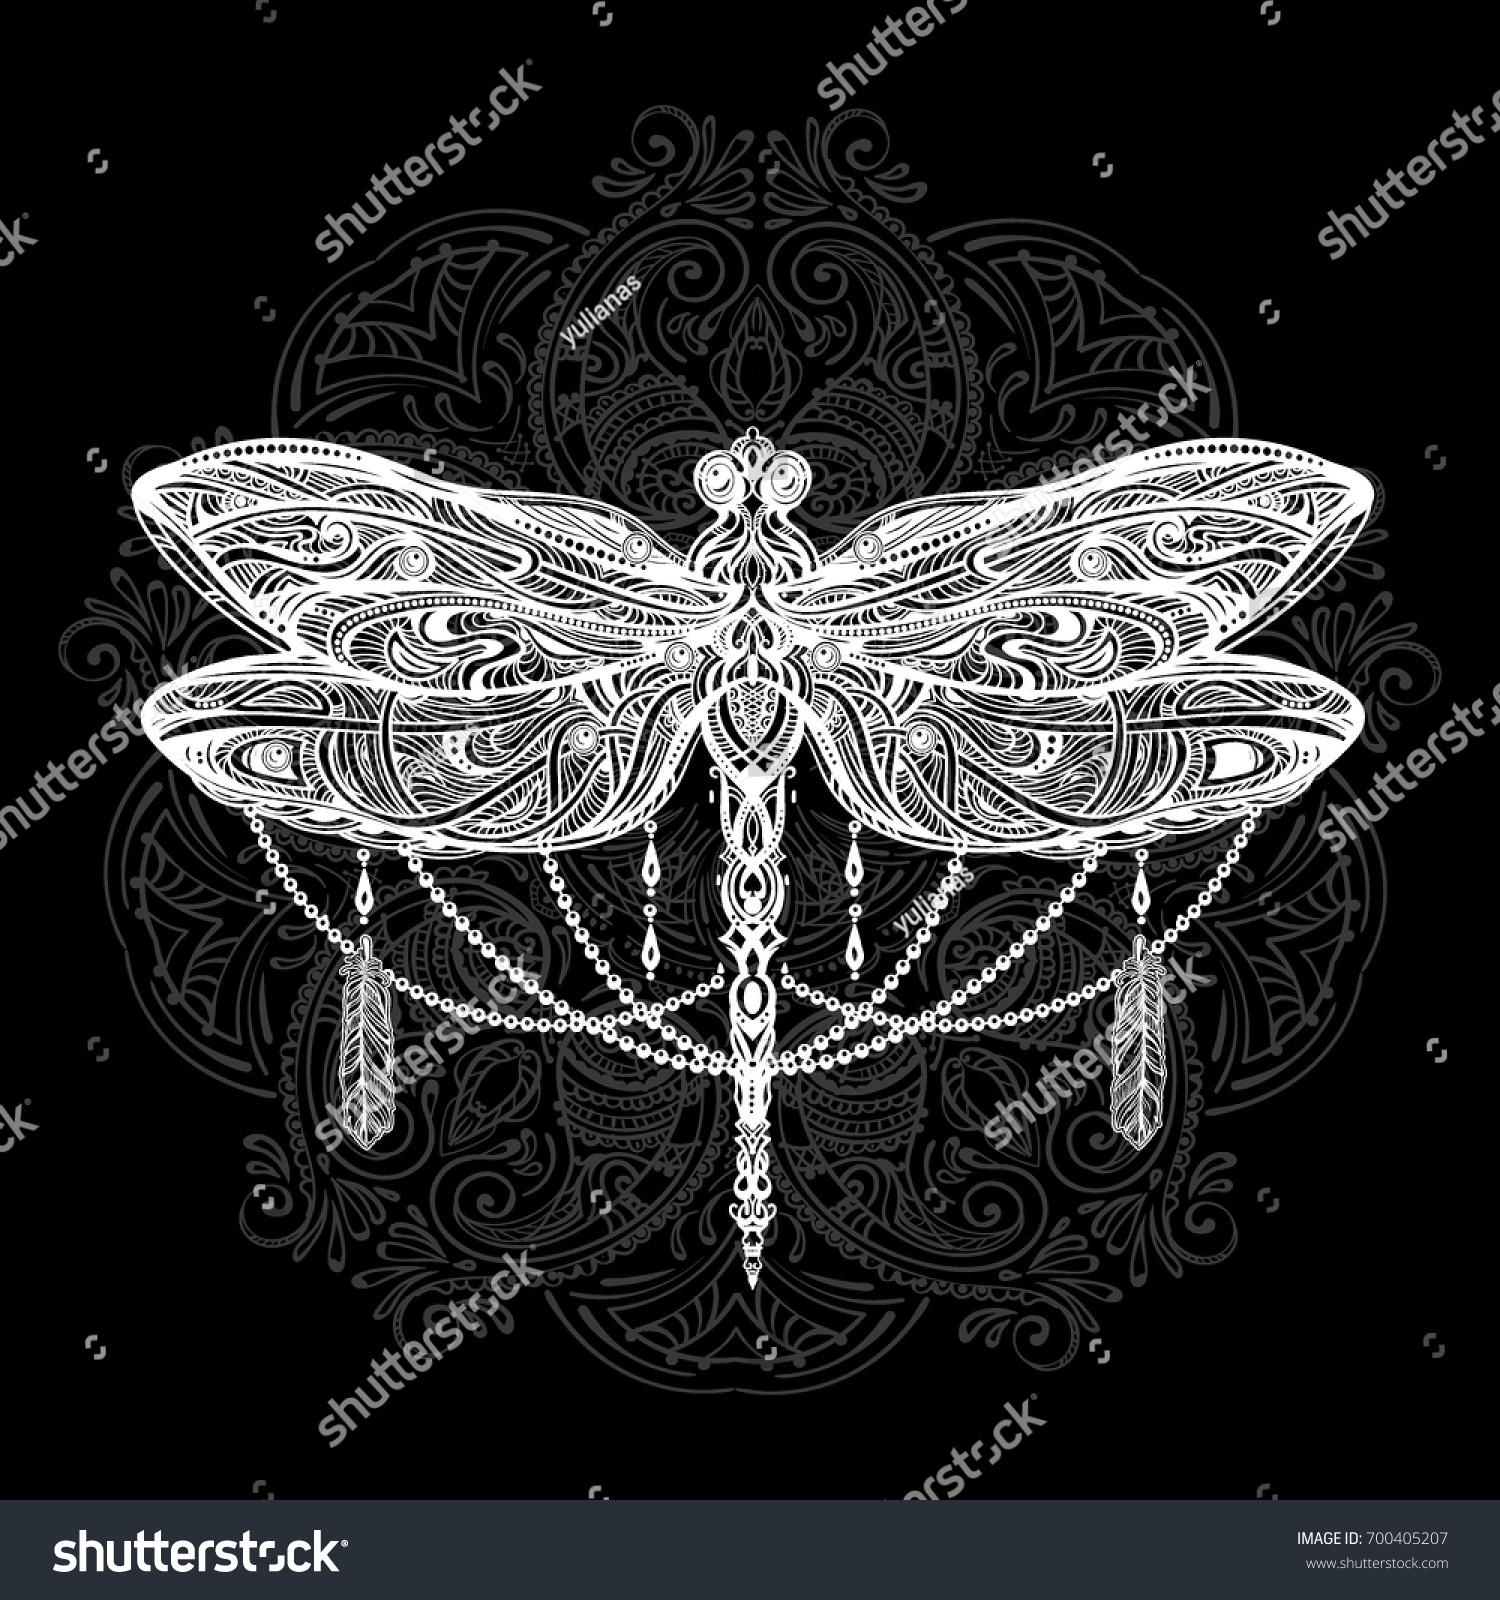 Exquisite ornate stylized dragonfly spiritual esoteric stock exquisite ornate stylized dragonfly spiritual esoteric totem symbol of africa india biocorpaavc